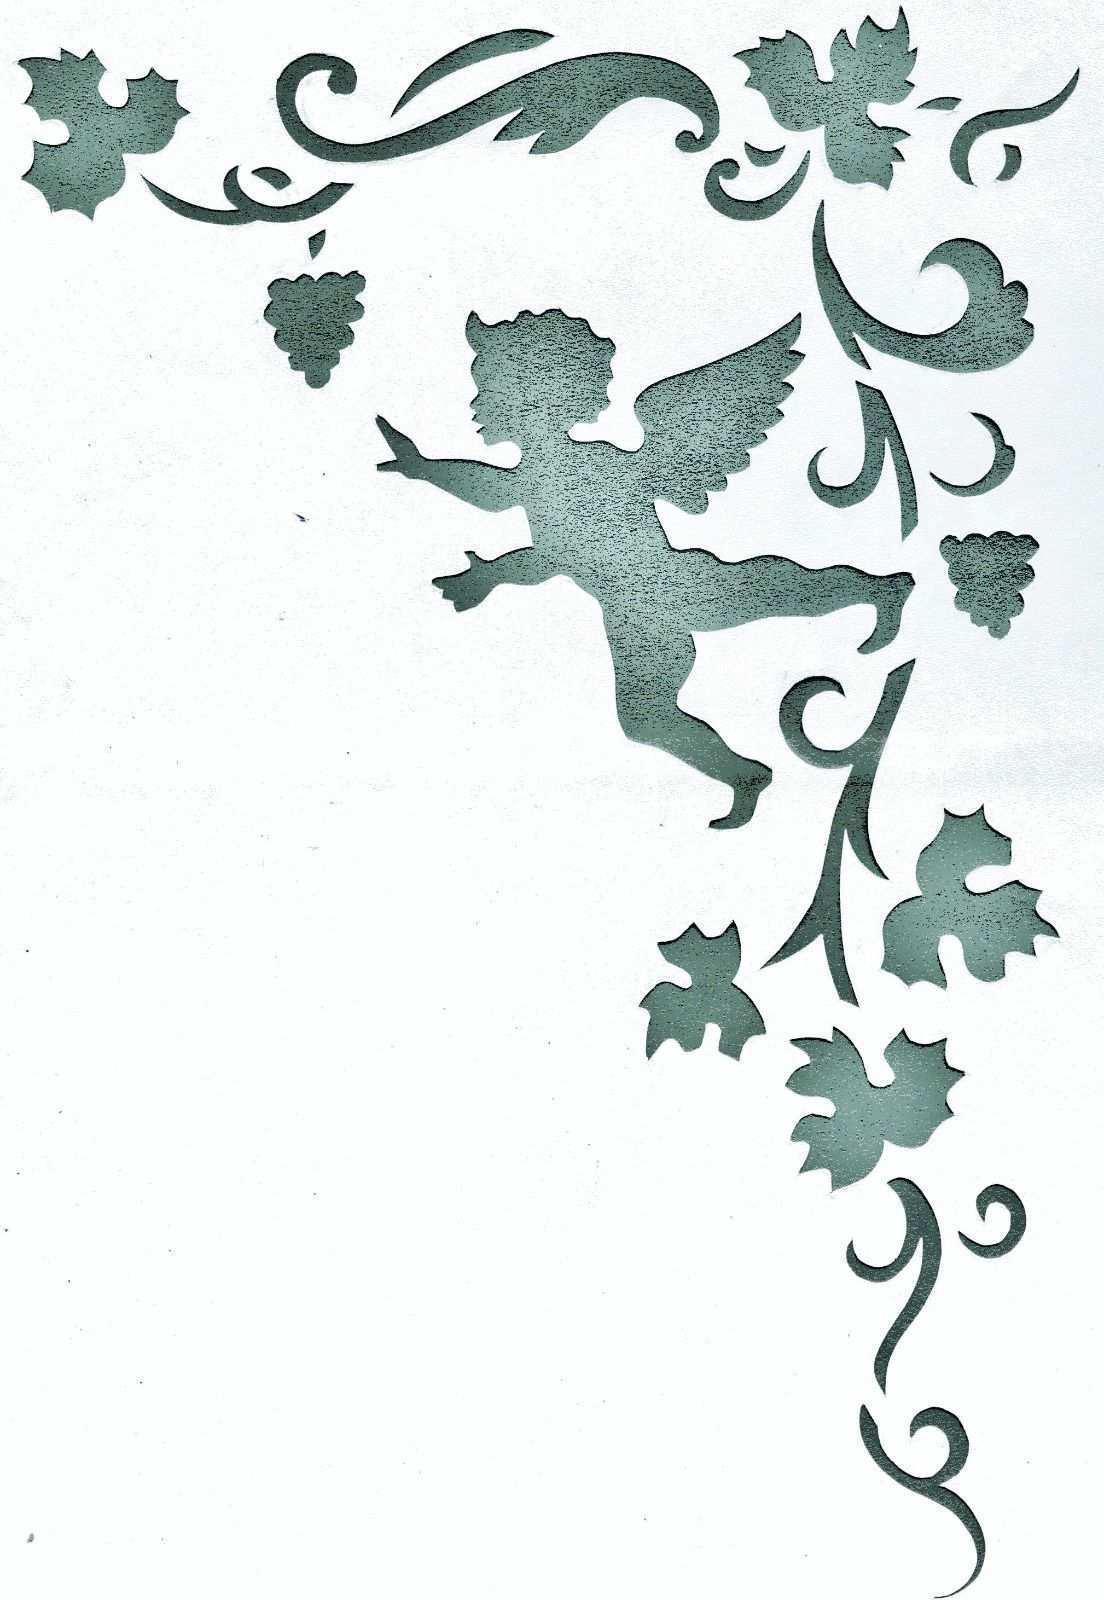 Wandschablonen Schablone Wandtattoo Ornament Engel Wandschablonen Schablonen Bucher Falten Vorlage